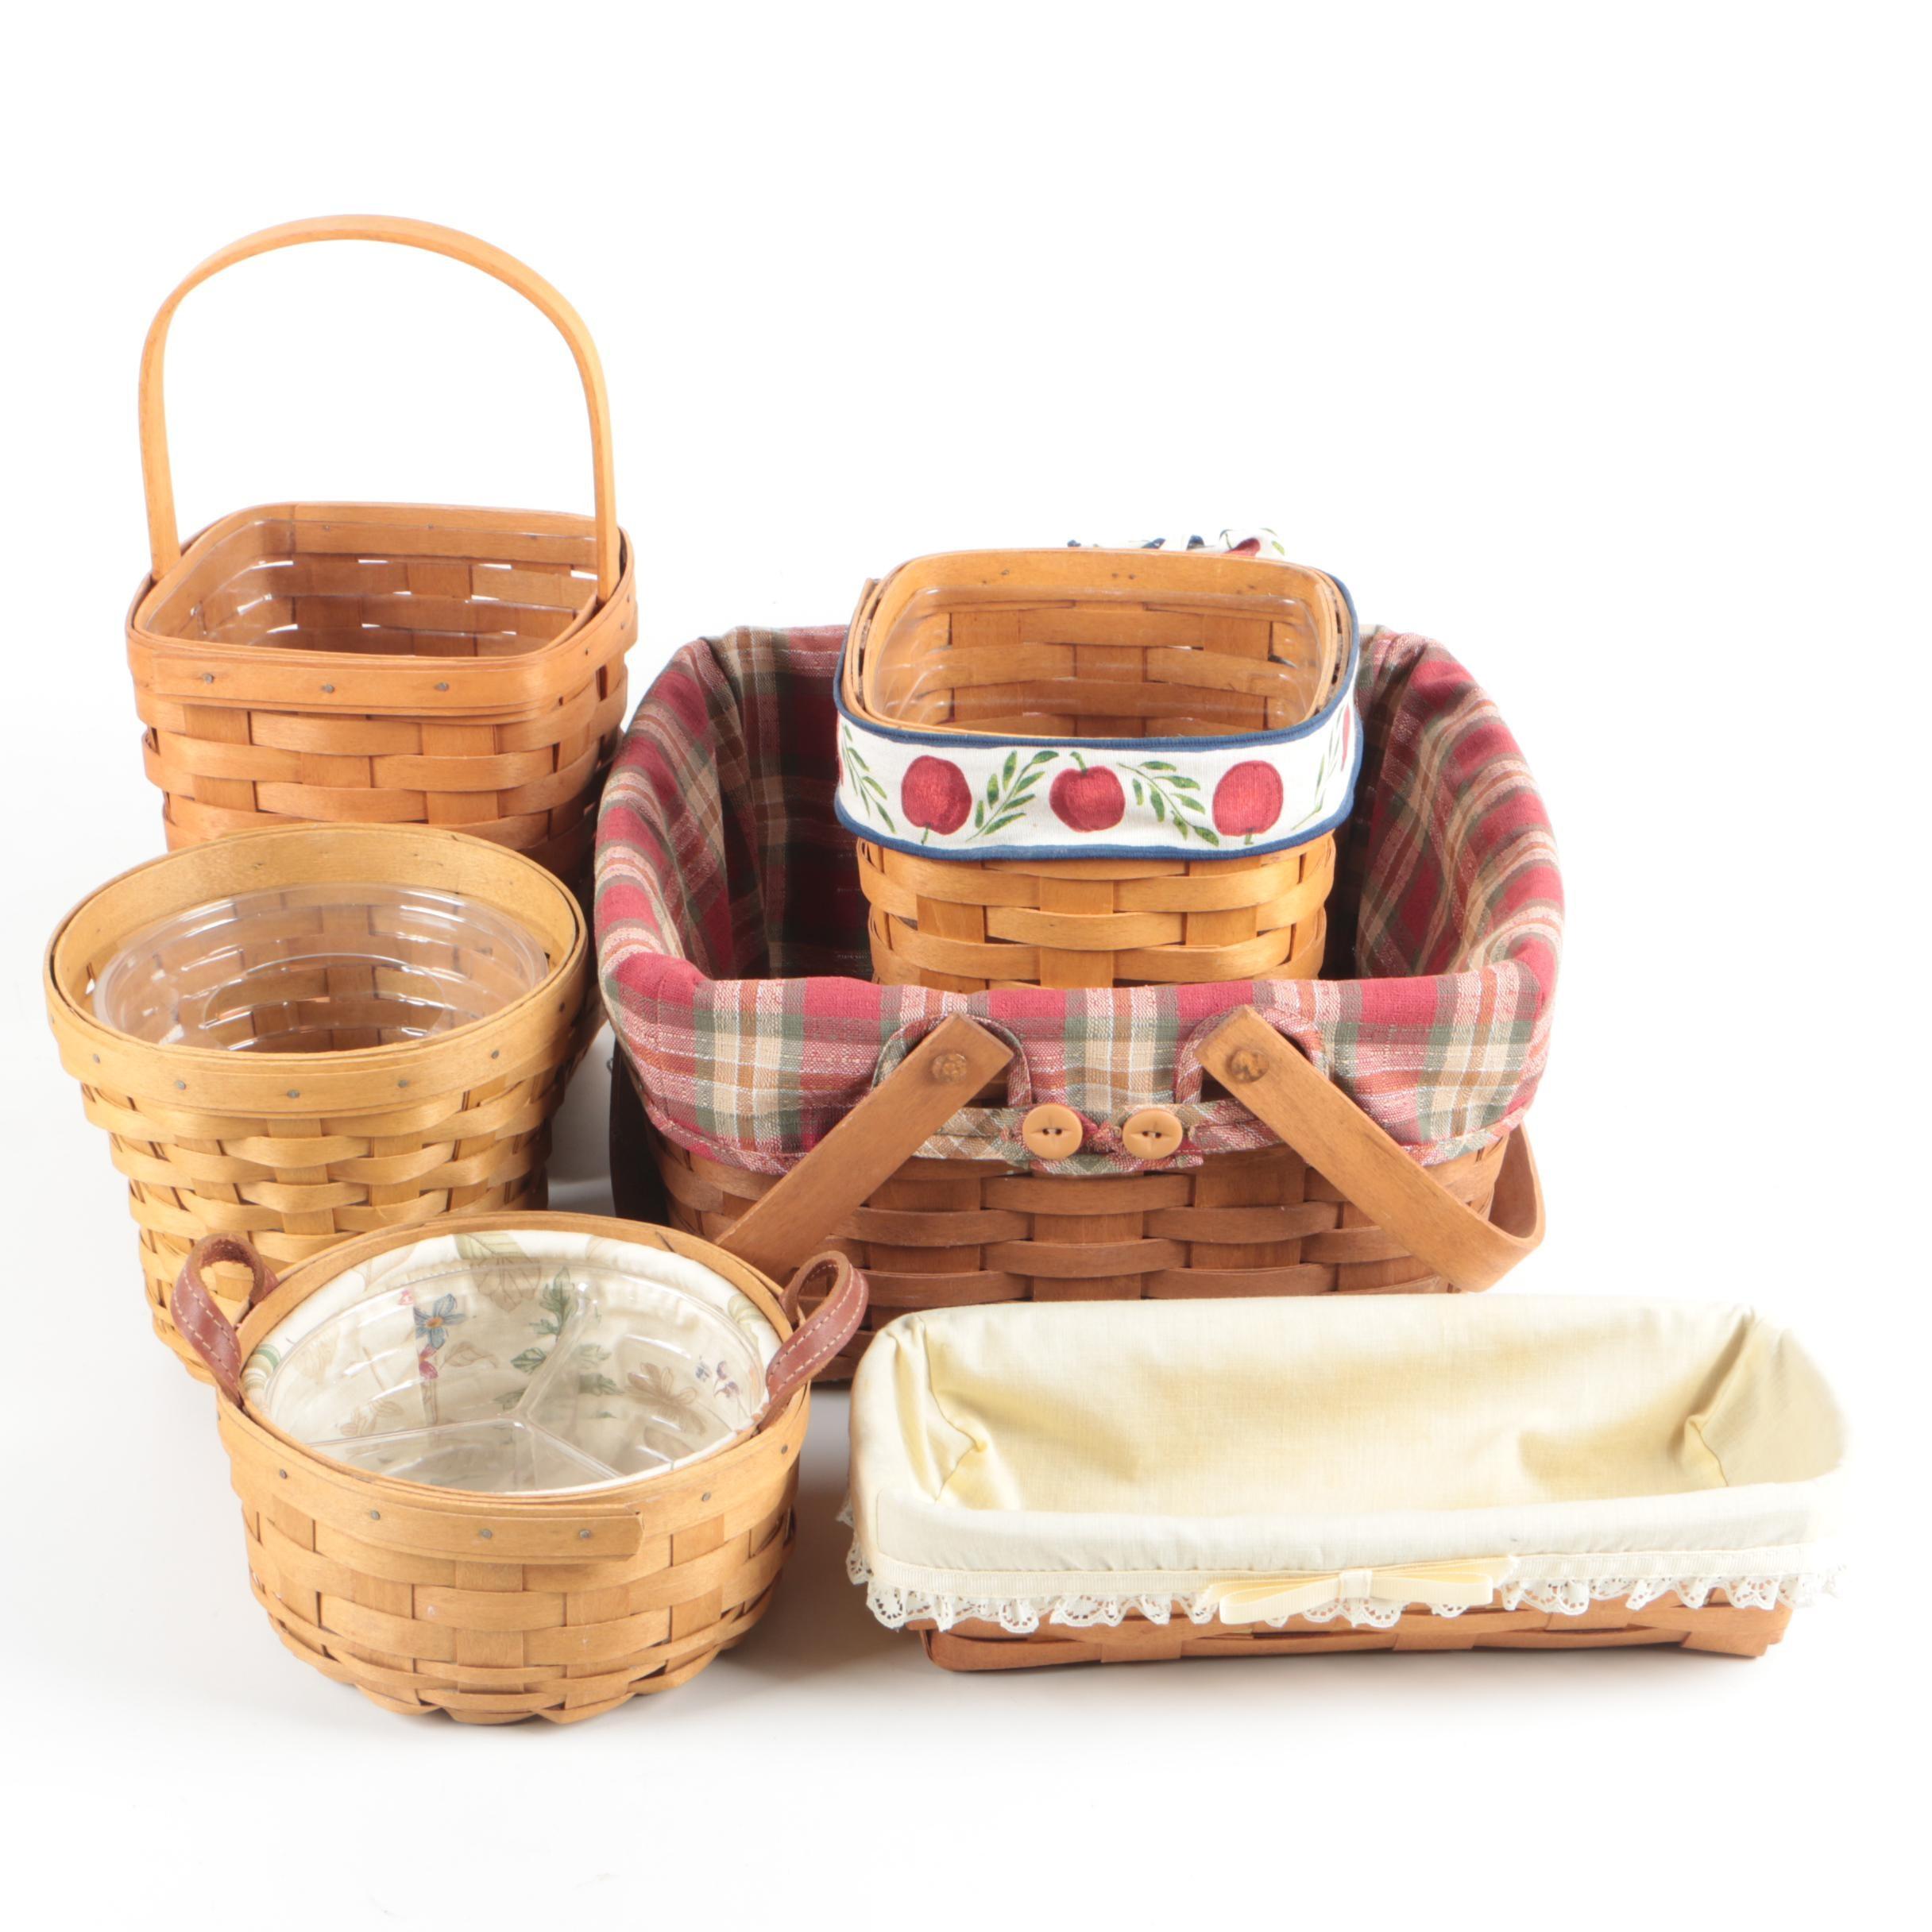 Longaberger Handwoven Baskets including Liners